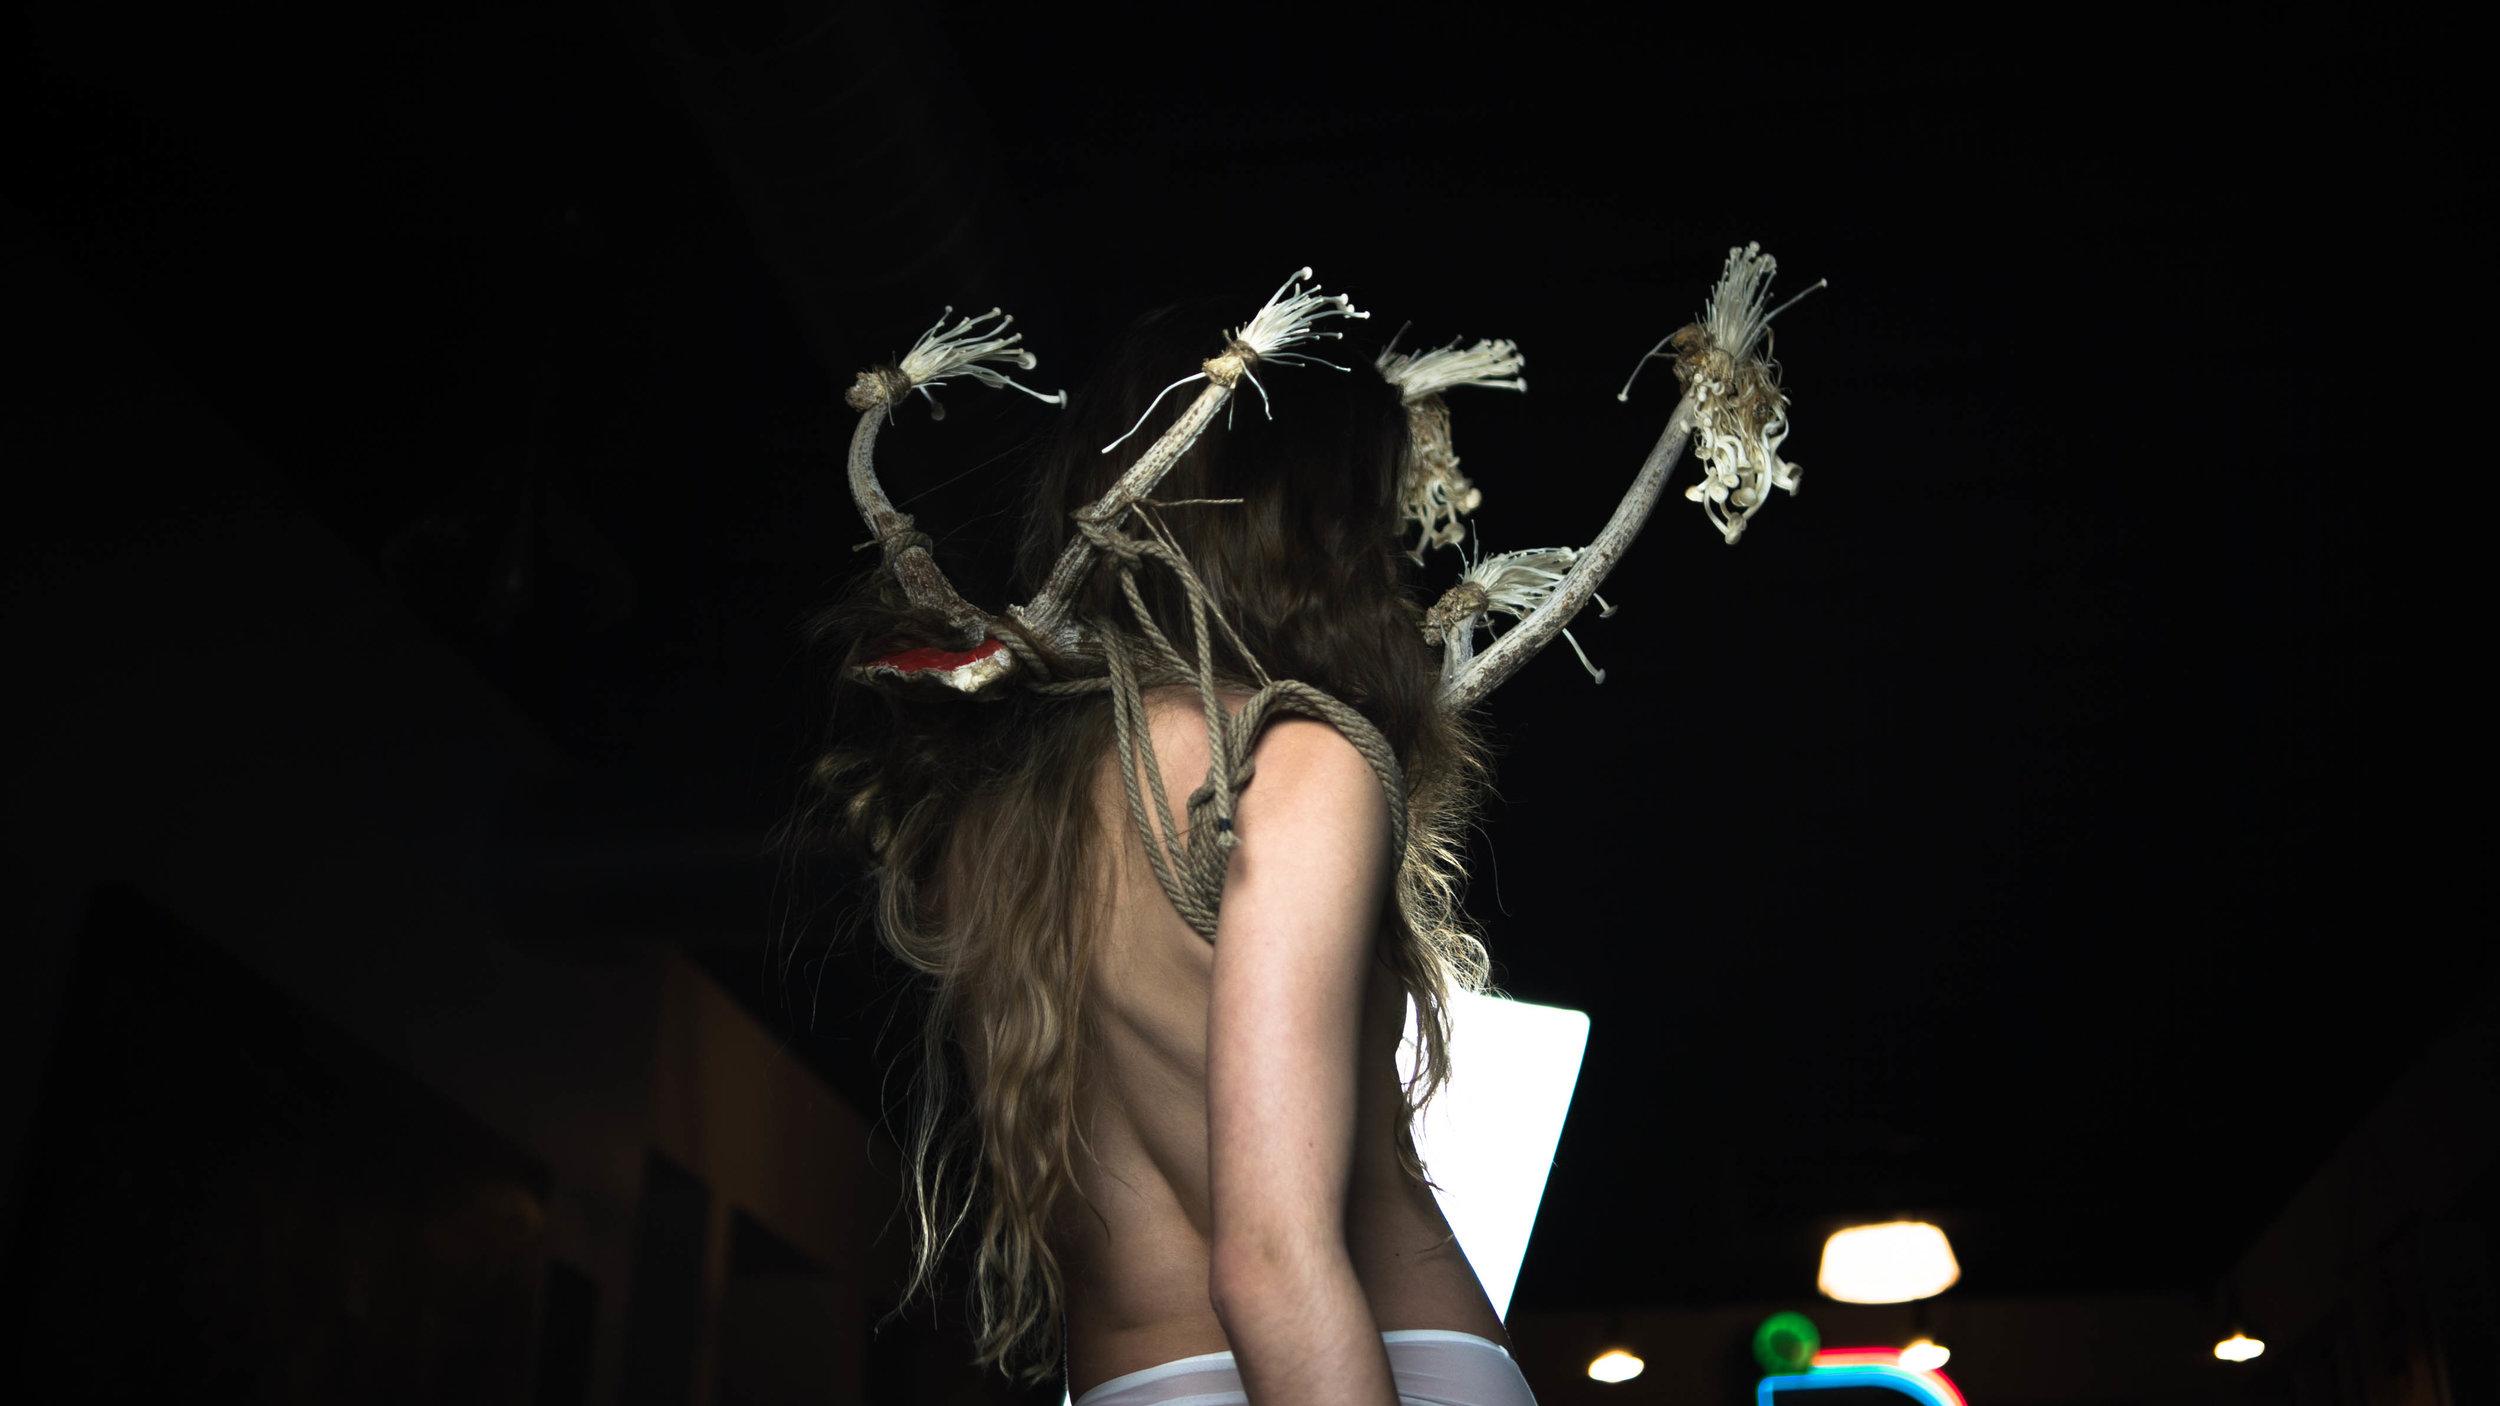 oliver franklin anderson, reindeer, caribou, antlers, rack, red, mushrooms, bondage, tied, decorative, shroom, fungi, fashion film, bdsm, rope, twisted monk, figure drawing, life drawing, prop, nature, natural, design, radish, erotic, appleton, wisconsin, deer, bones, fashion, fashion photography, styling, elegant